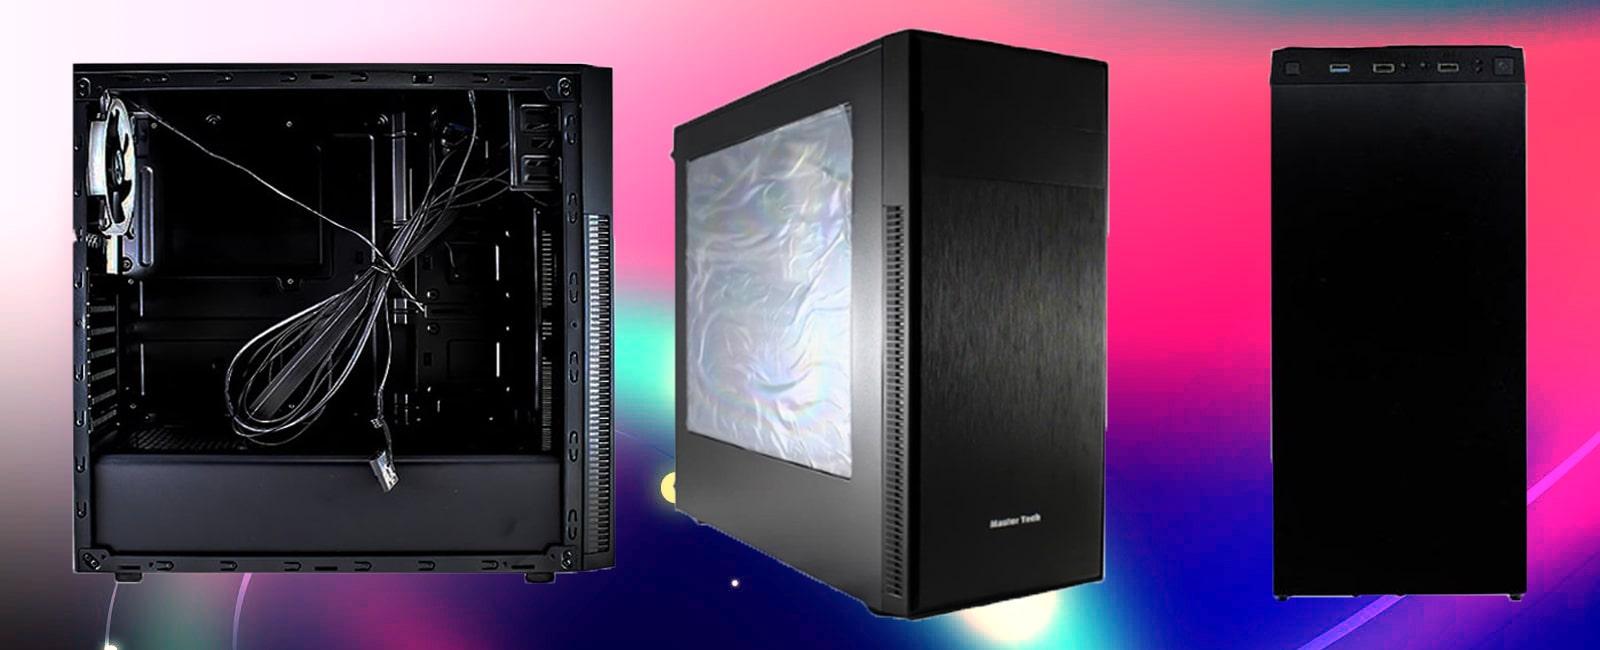 کیس گیمینگ کامپیوتر مسترتک مانترا Mantra